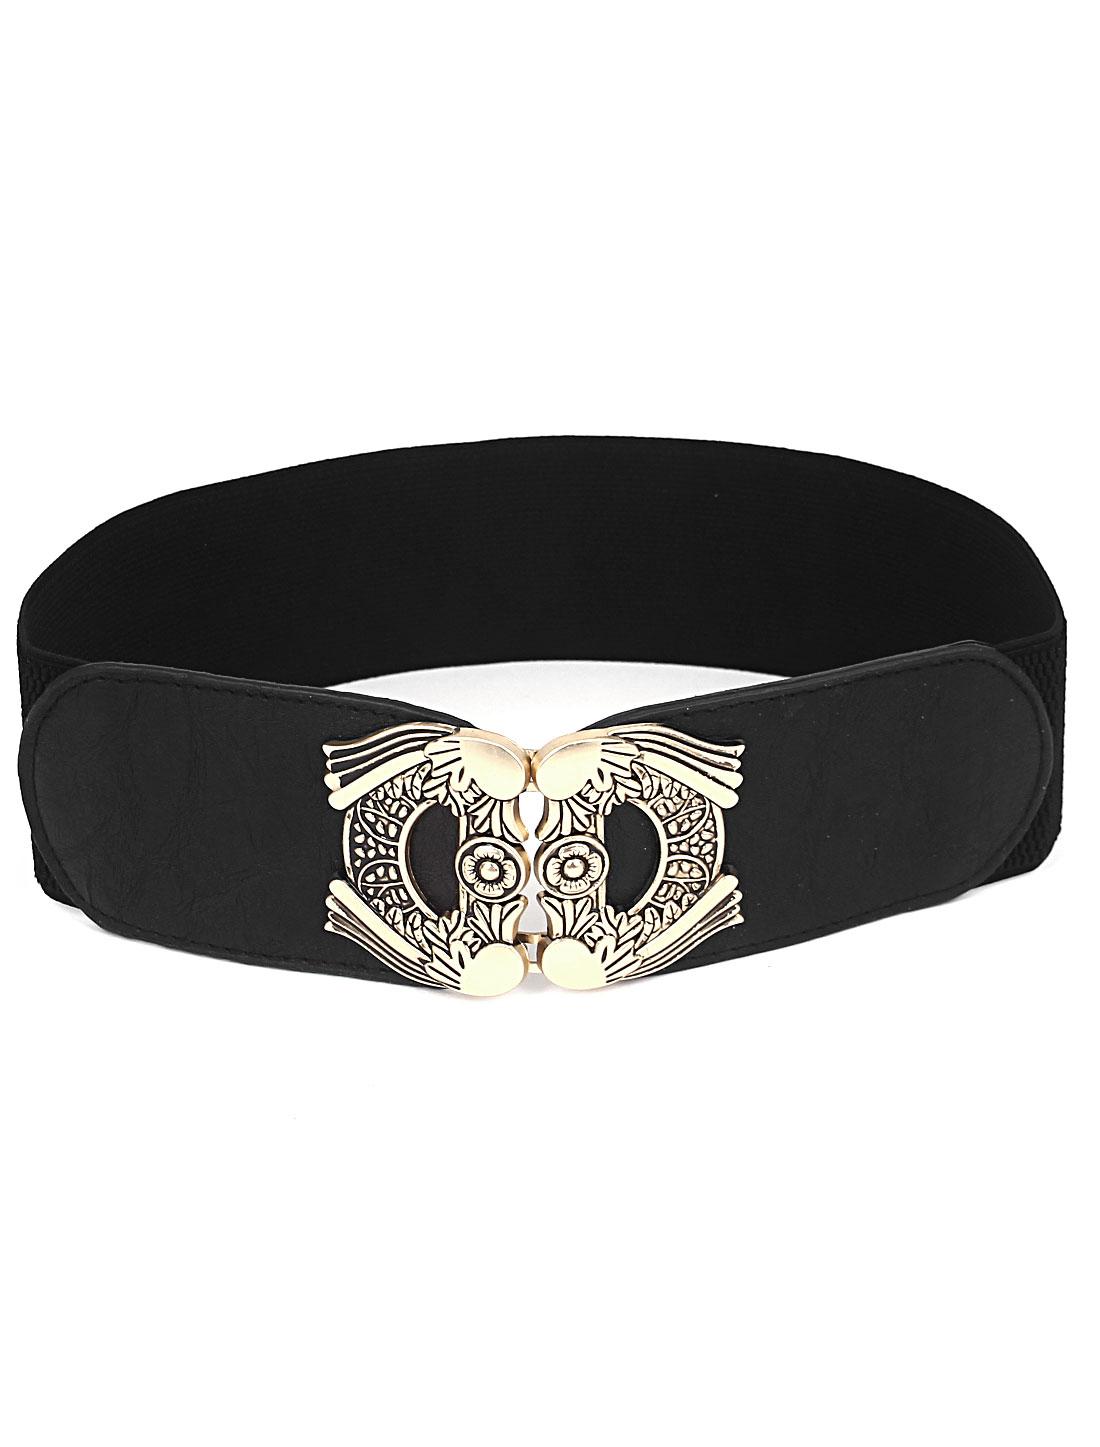 Lady Metal Interlocked Buckle Faux Leather Elastic Waist Cinch Belt Band Waistbelt Black